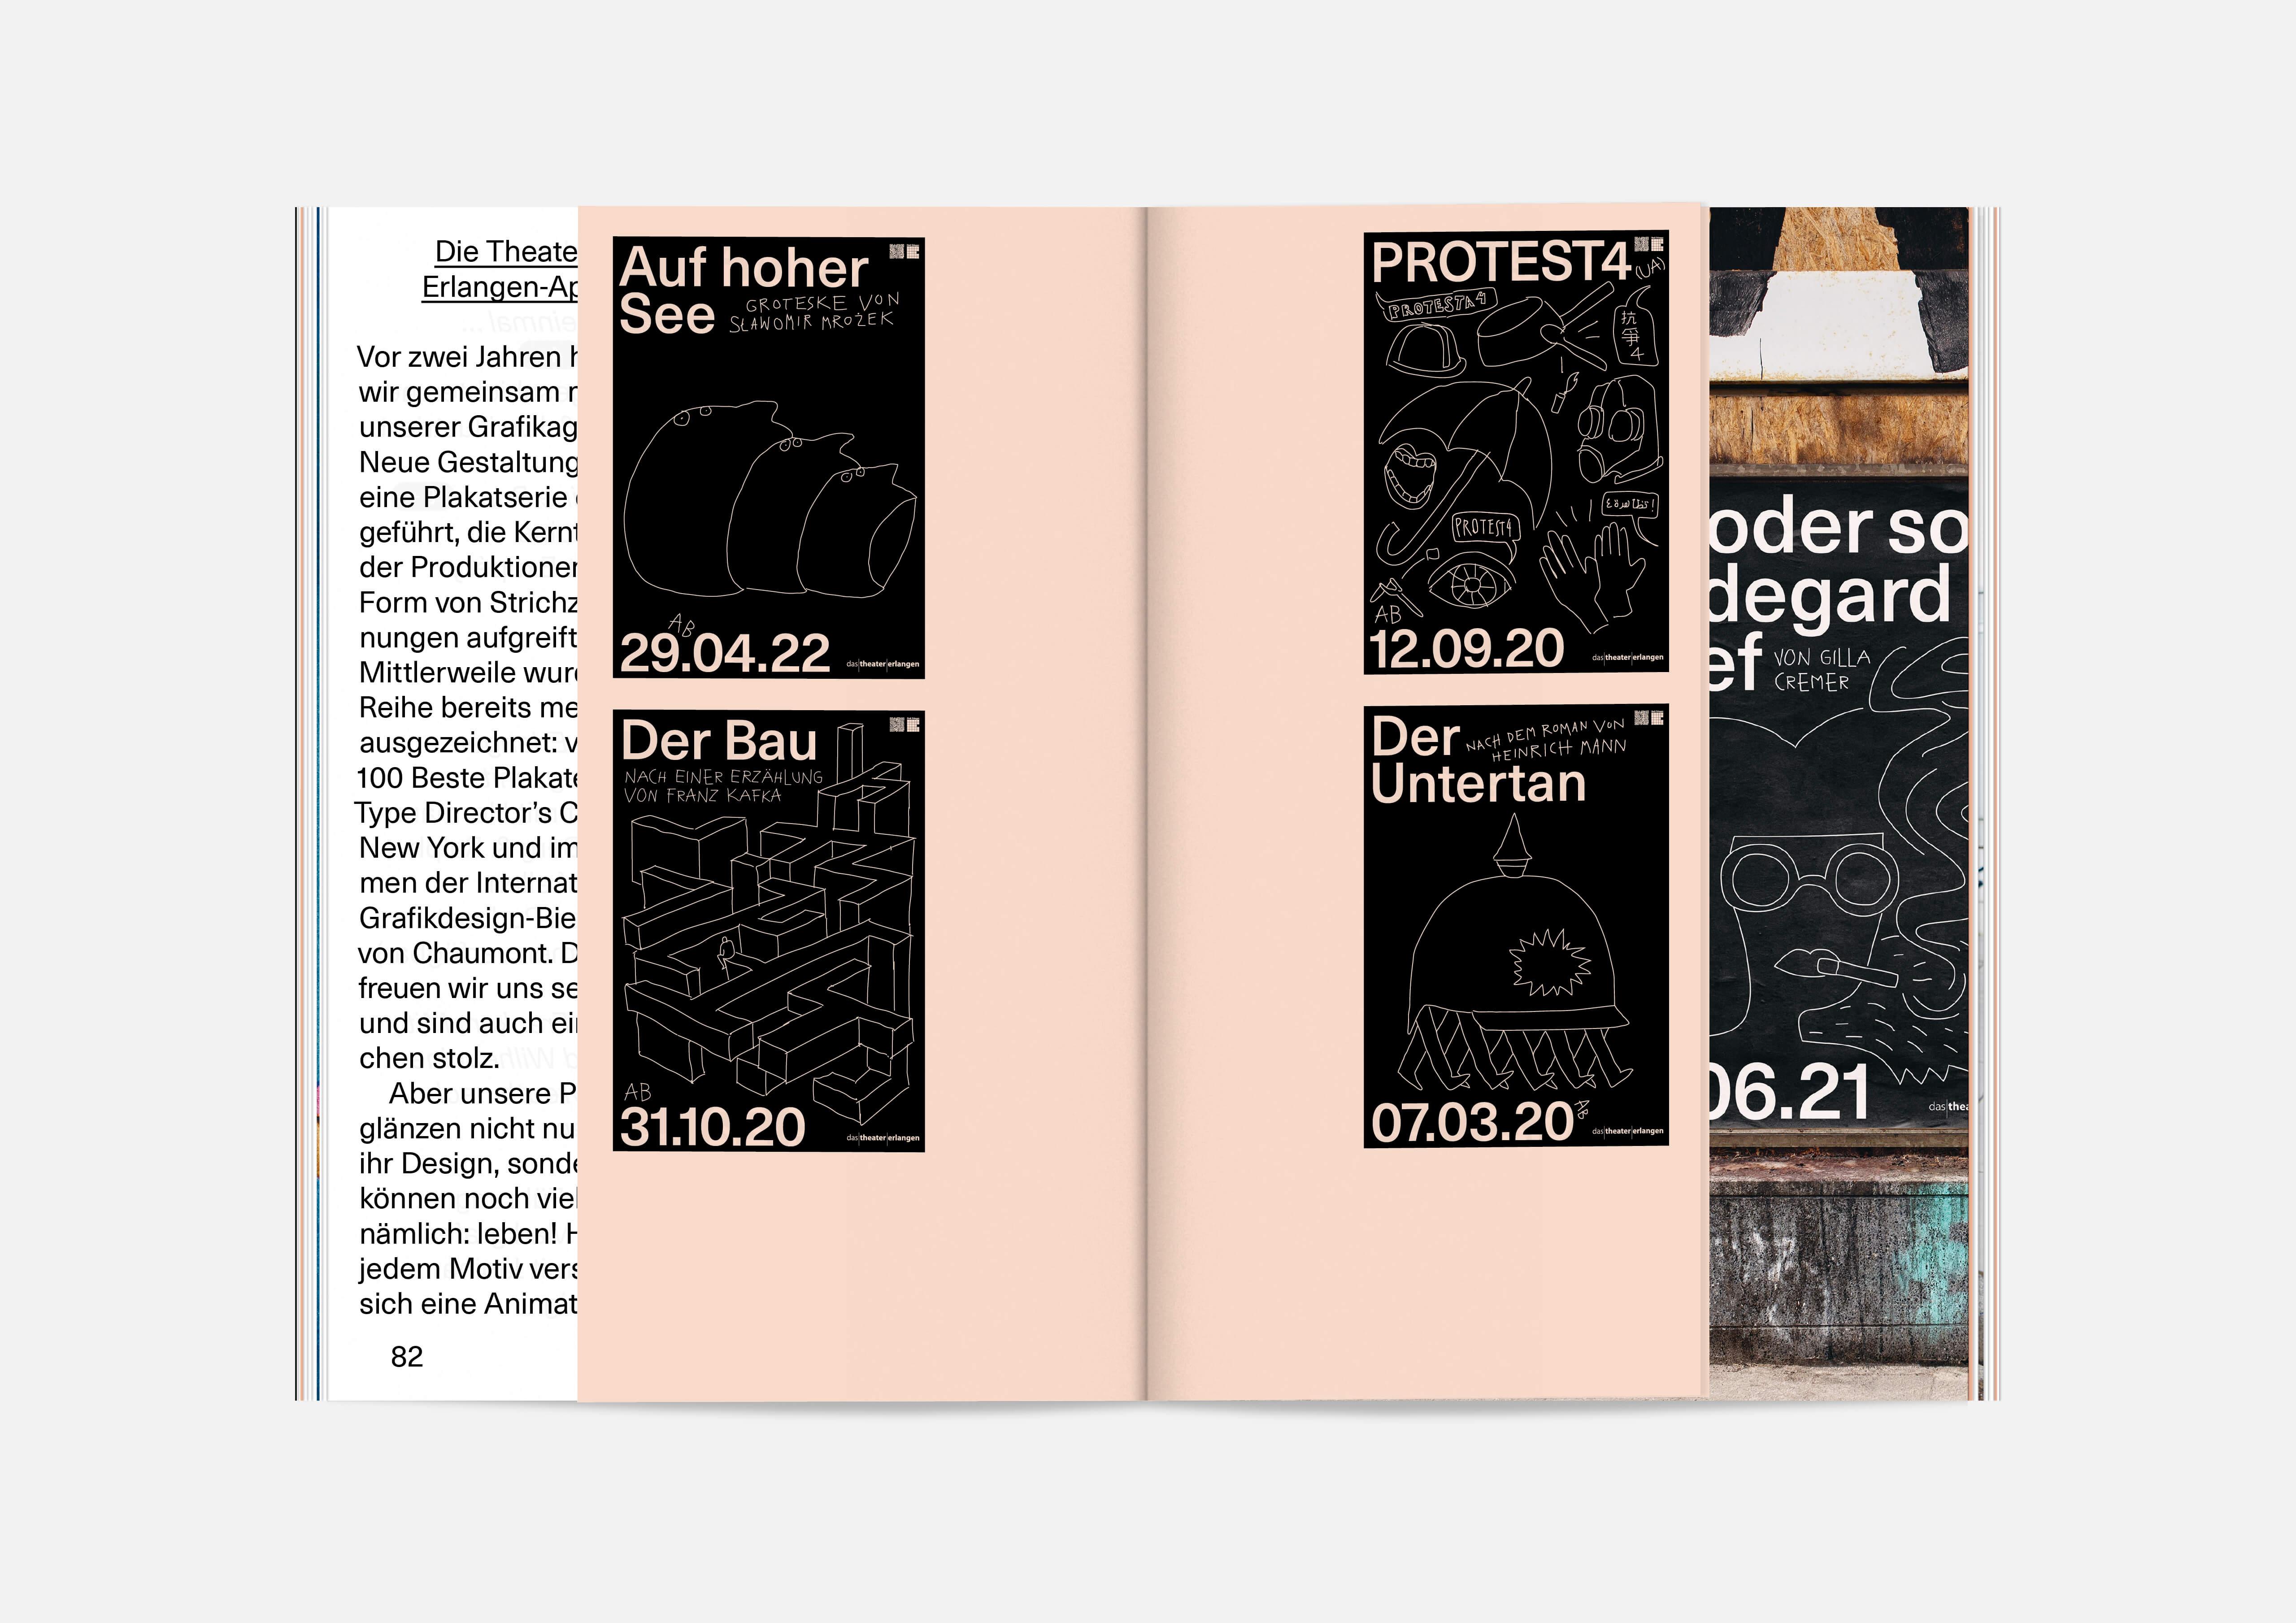 https://neuegestaltung.de/media/pages/clients/theater-erlangen-seasonal-program-2021-22/f7e4237979-1630497301/te-szh-202122_20.jpg